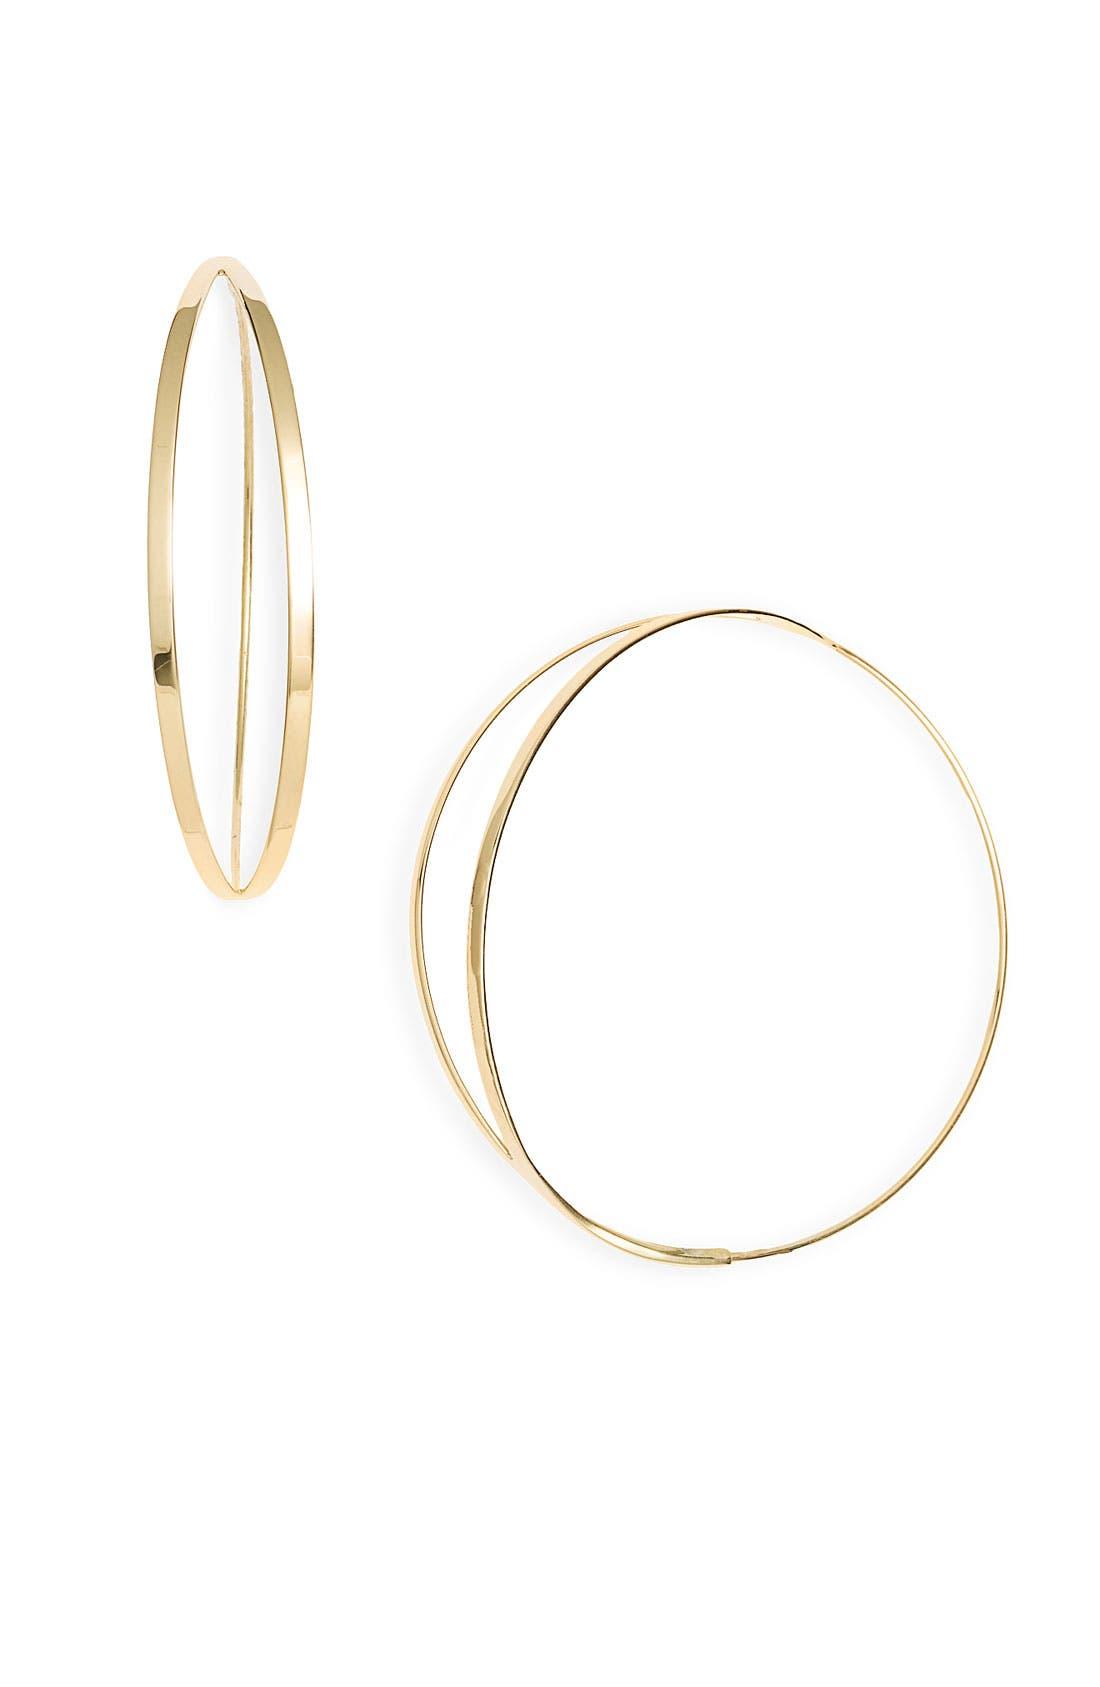 Main Image - Lana Jewelry 'Small Flirt' Hoop Earrings